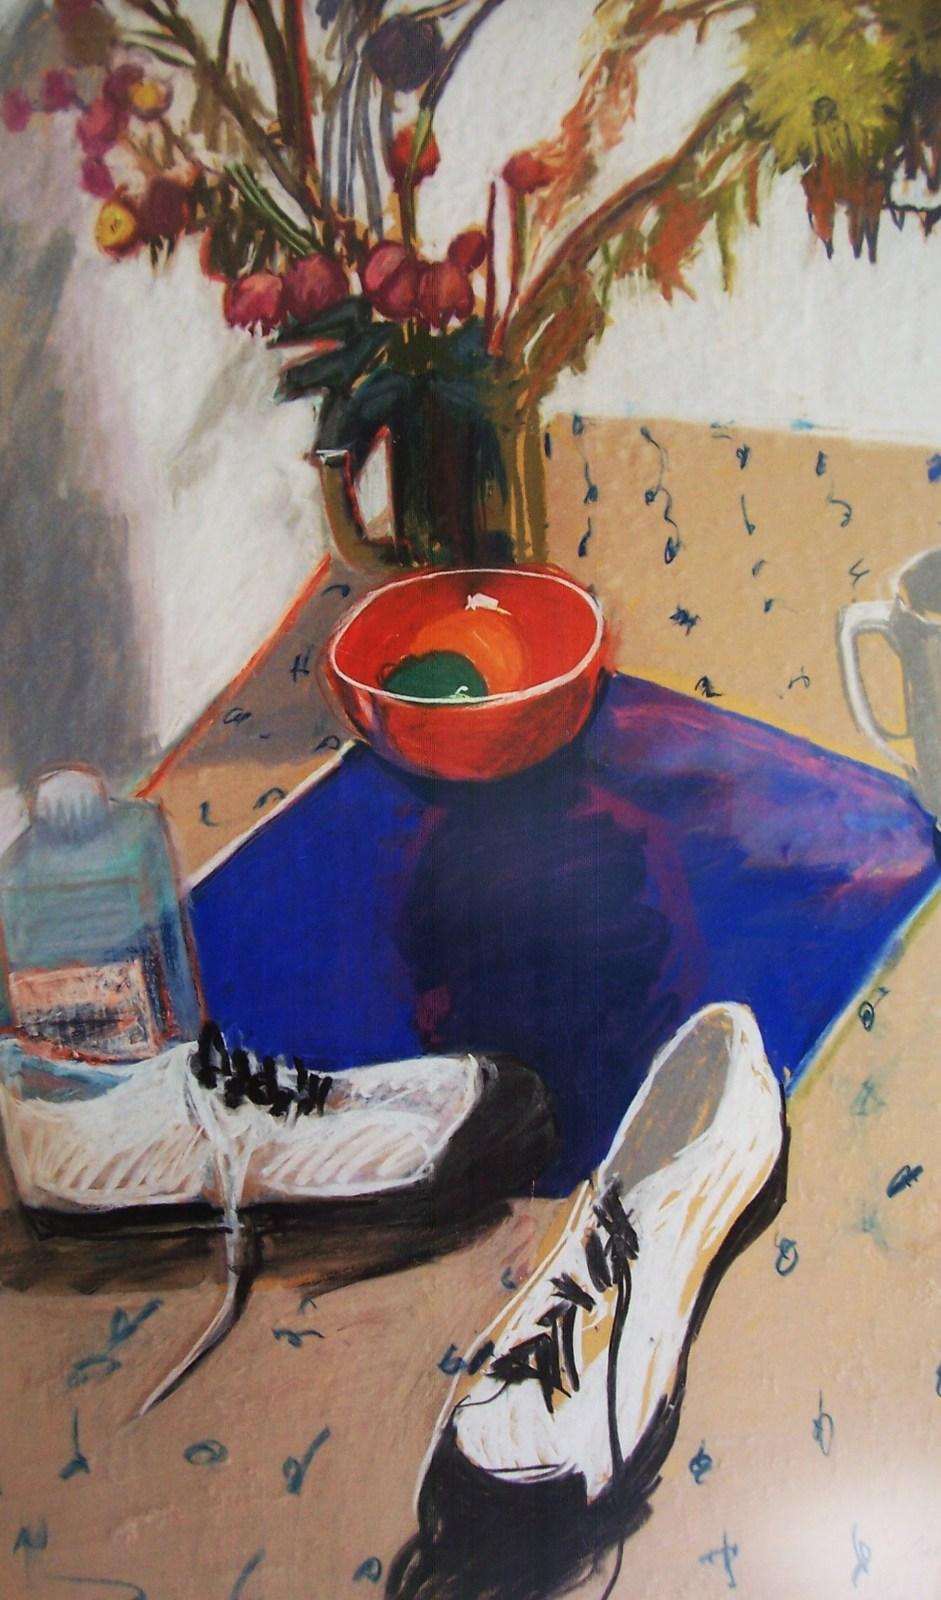 Original & Signed Galya Pillin Tarmu Large Still Life Pastel Painting LISTED ART